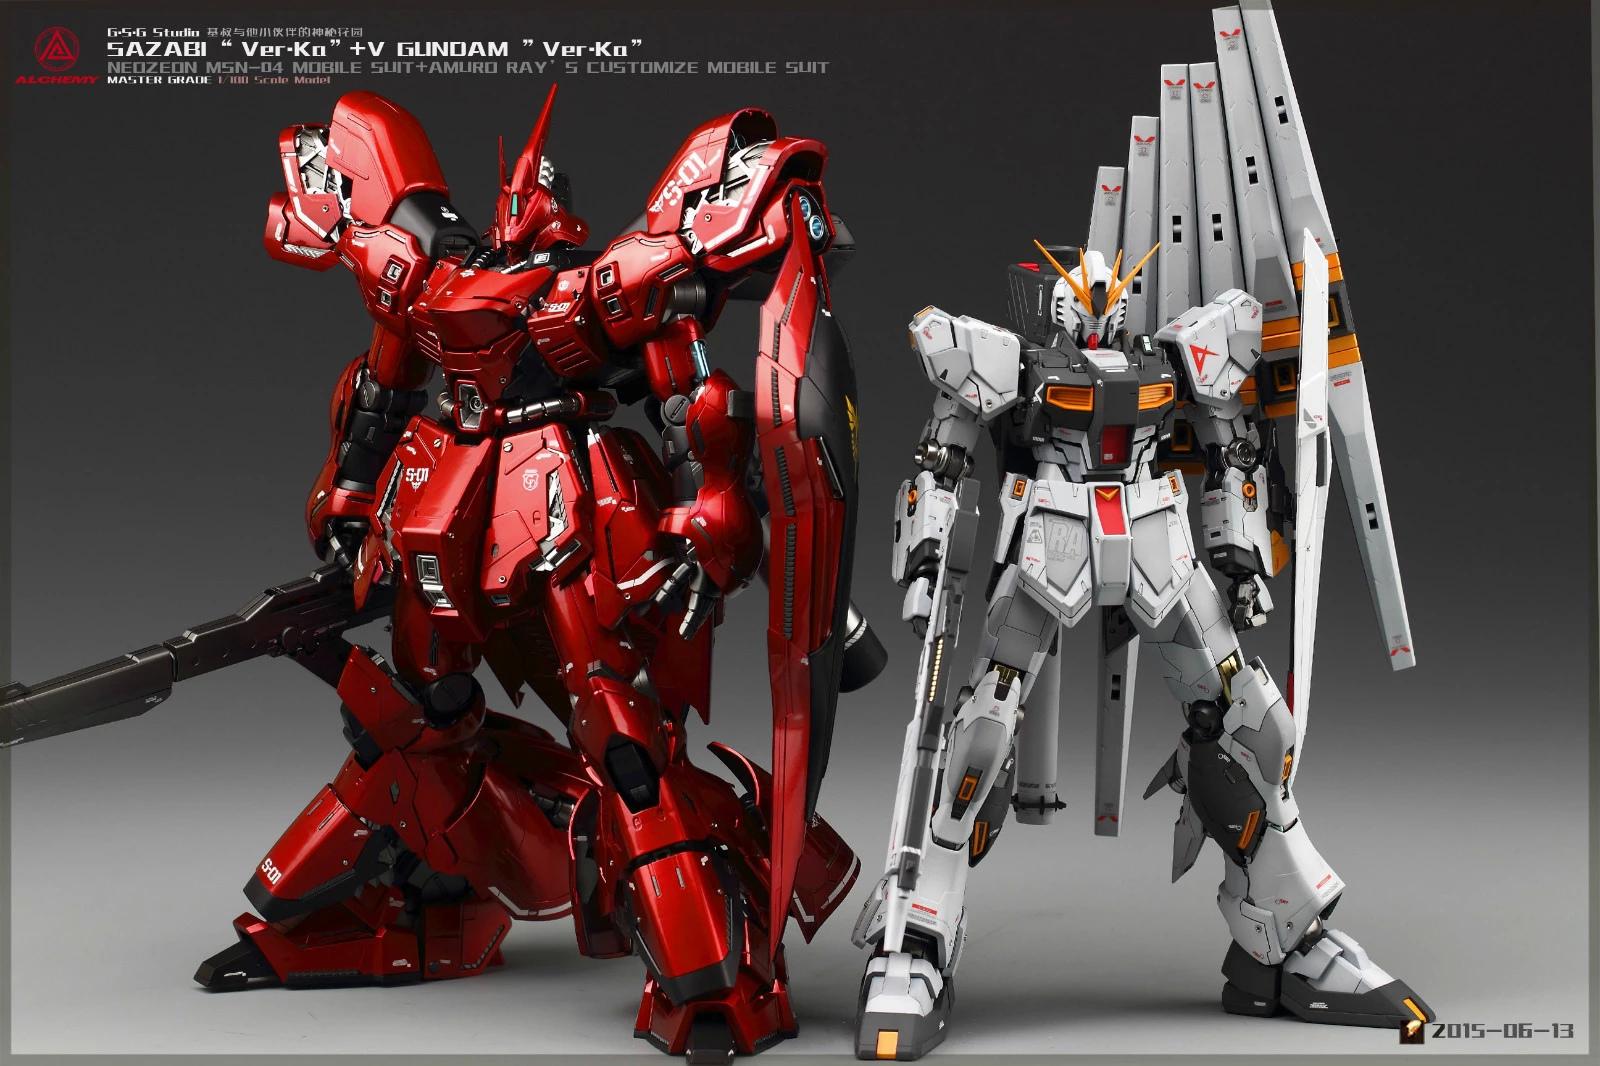 Nu Gundam and Sazabi